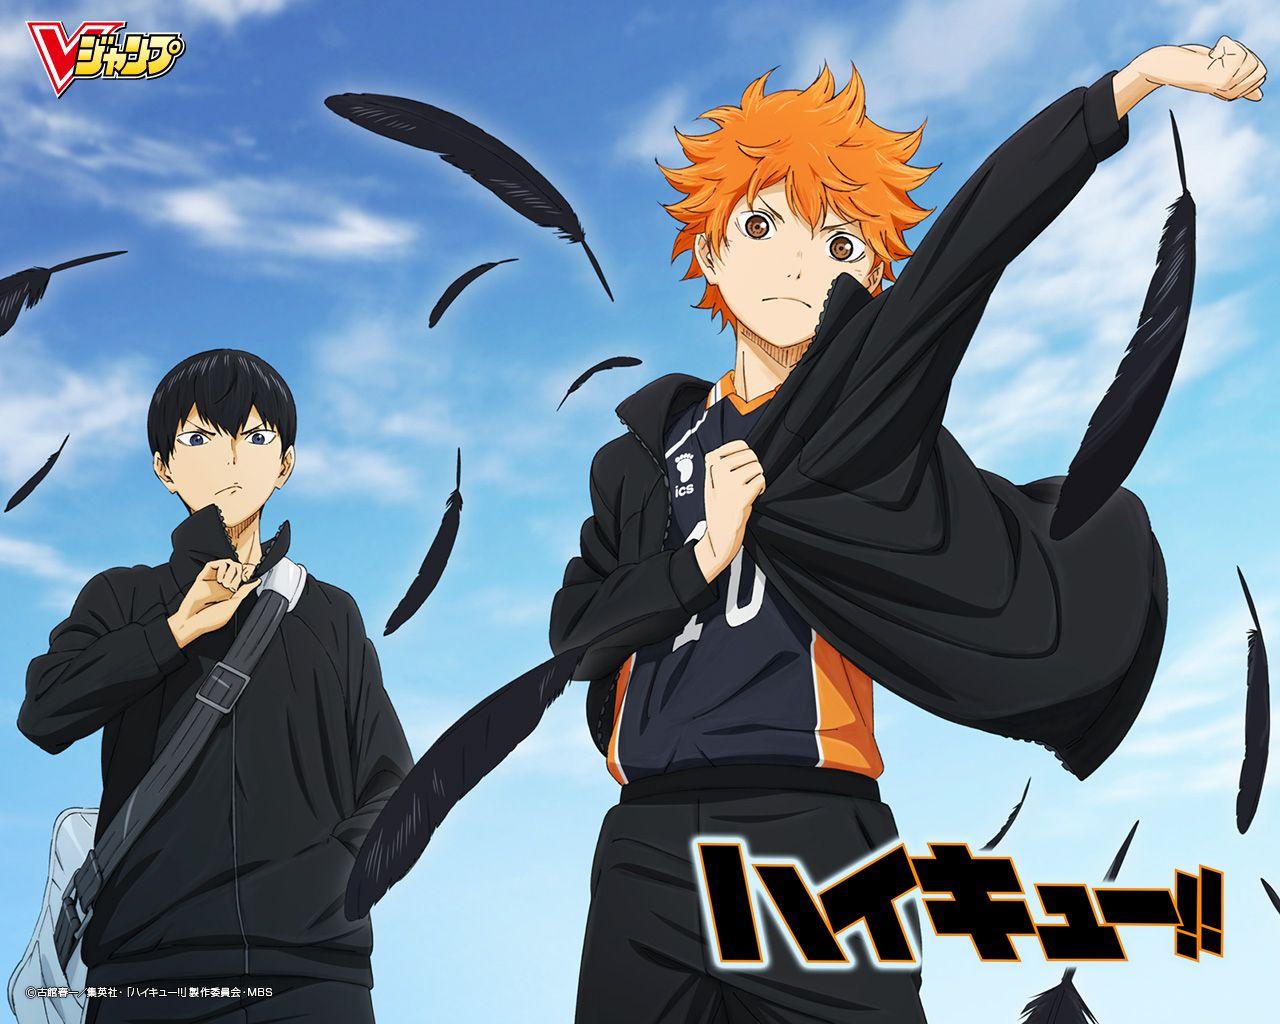 Download haikyuu 1280x1024 minitokyo haikyuu anime